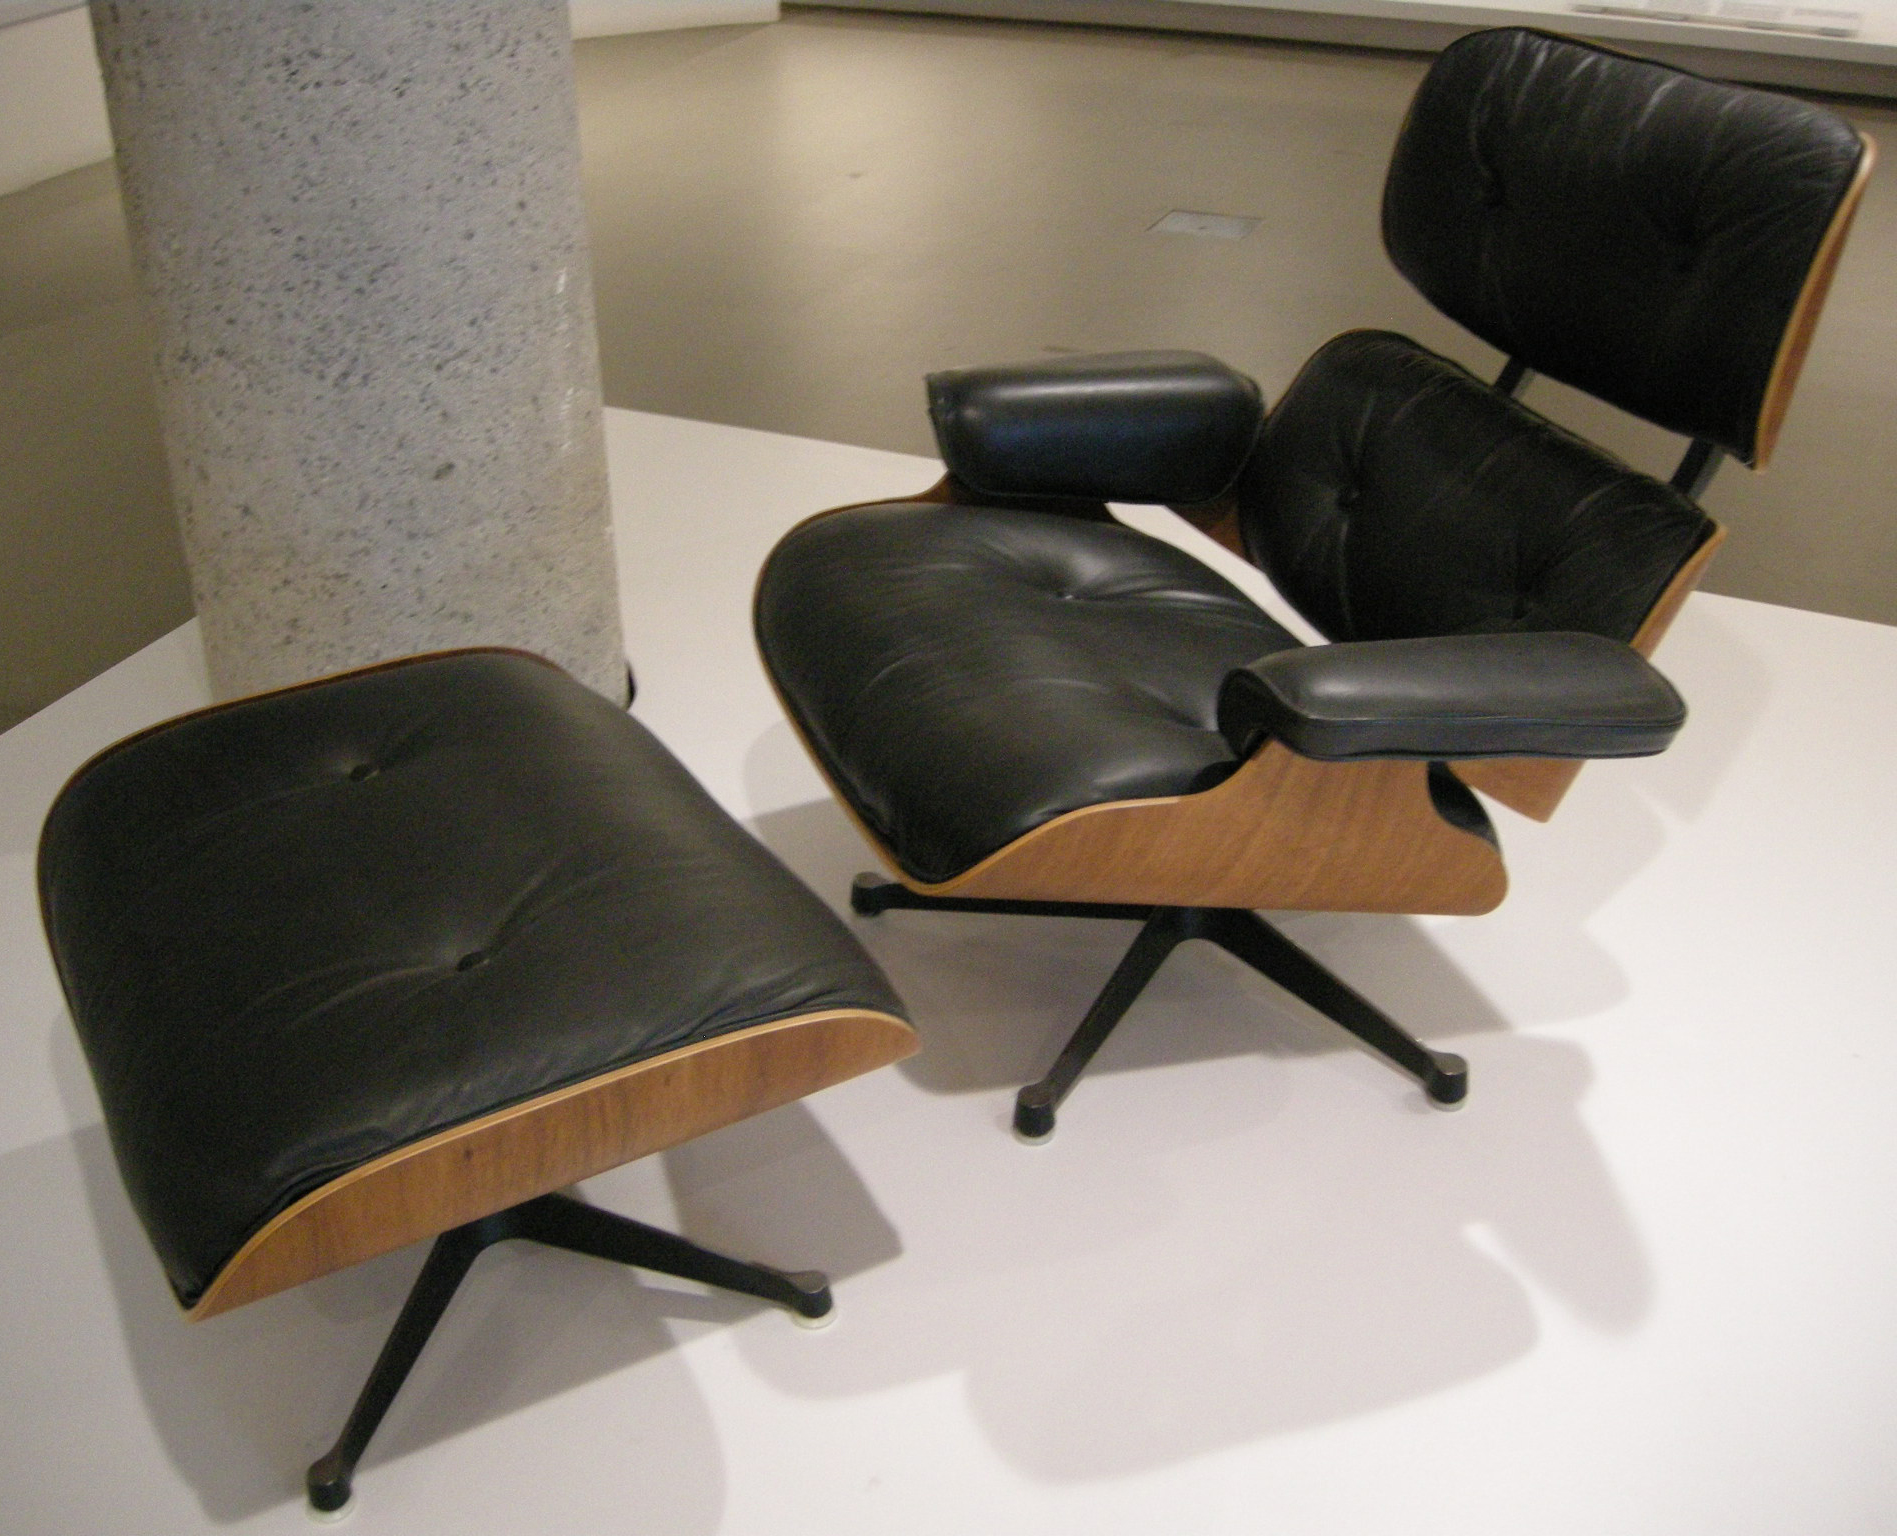 FileNgv design charles eames and herman miller lounge